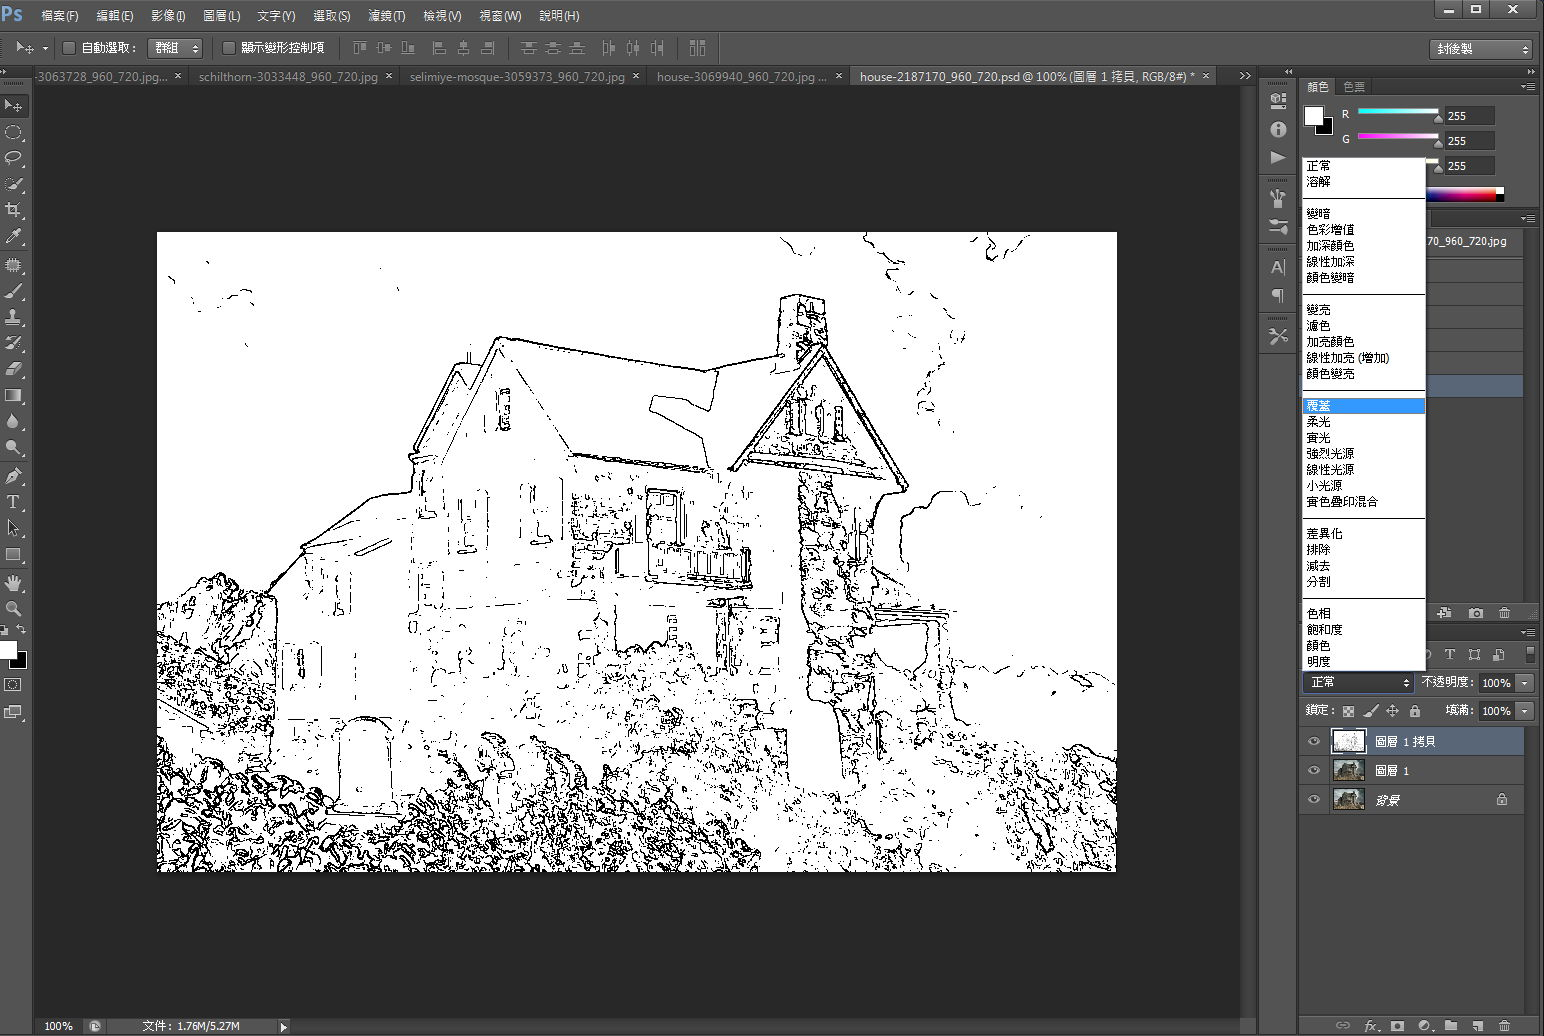 【PS色铅笔】PHOTOSHOP色铅笔手绘风格档下载